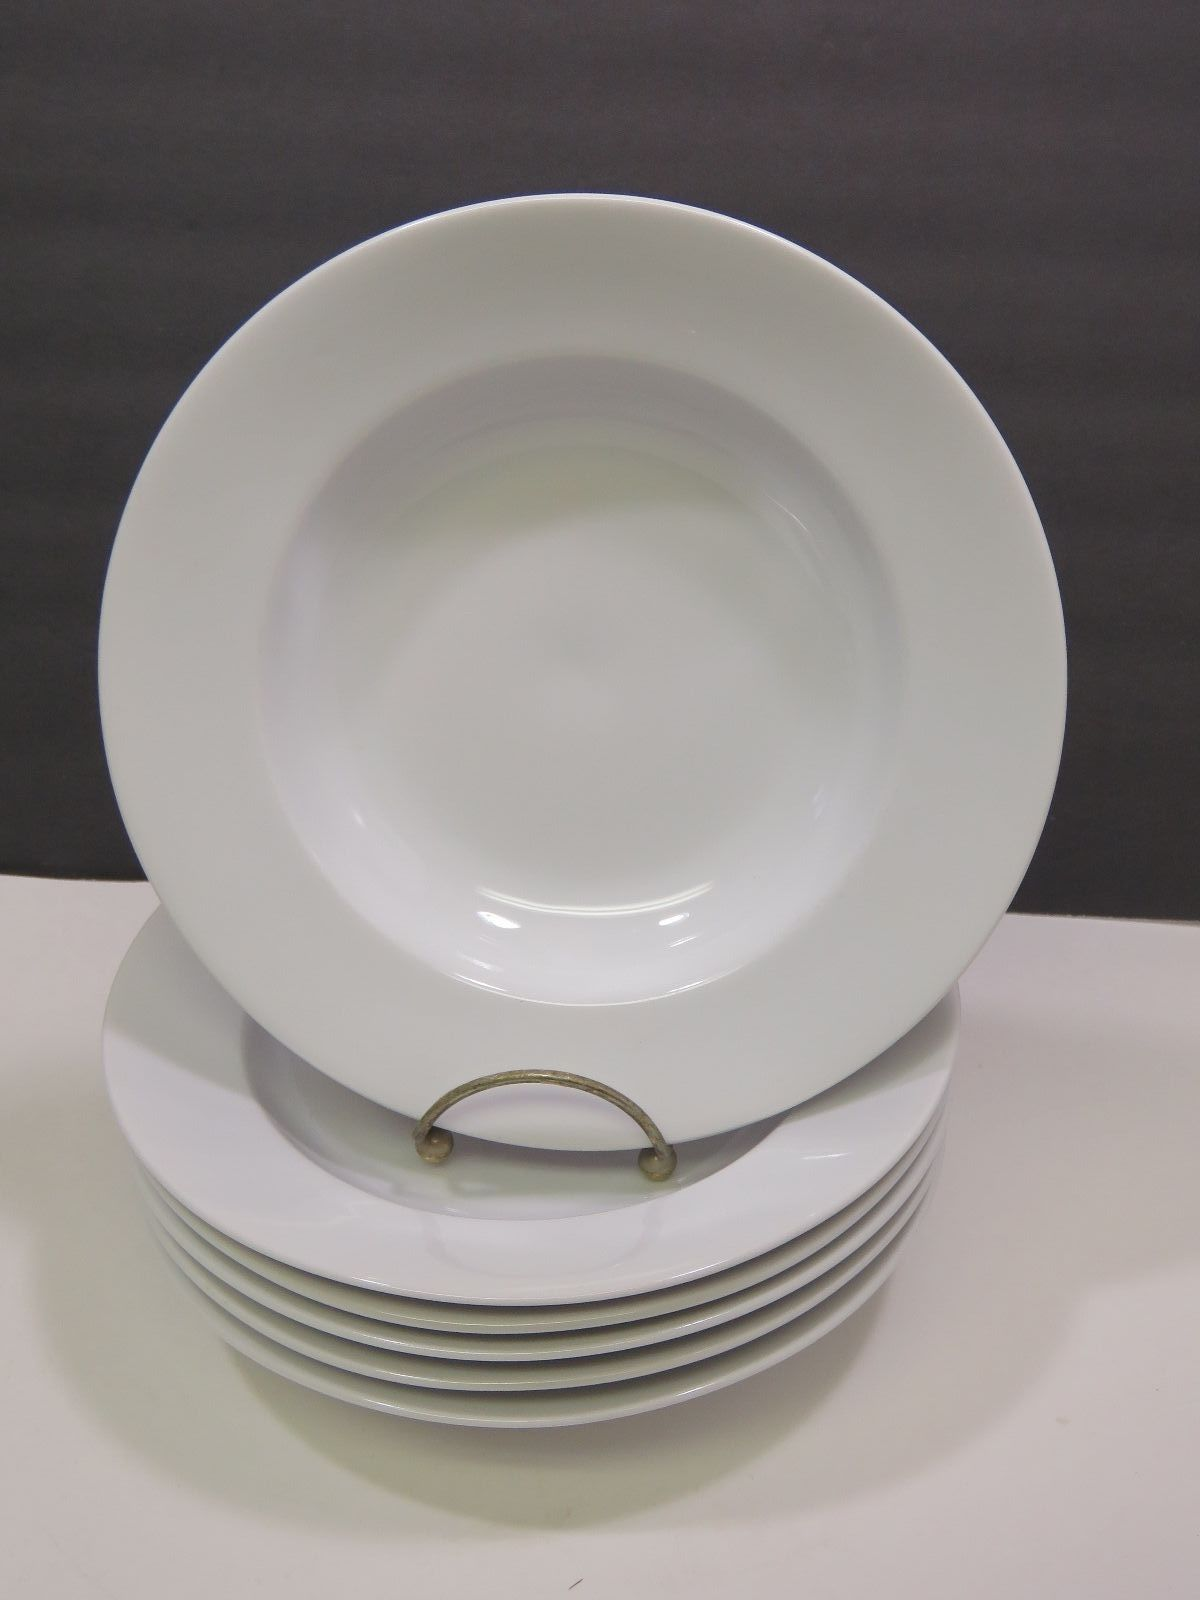 & Set of 6 Dansk White Cafe Blanc Portugal and 15 similar items